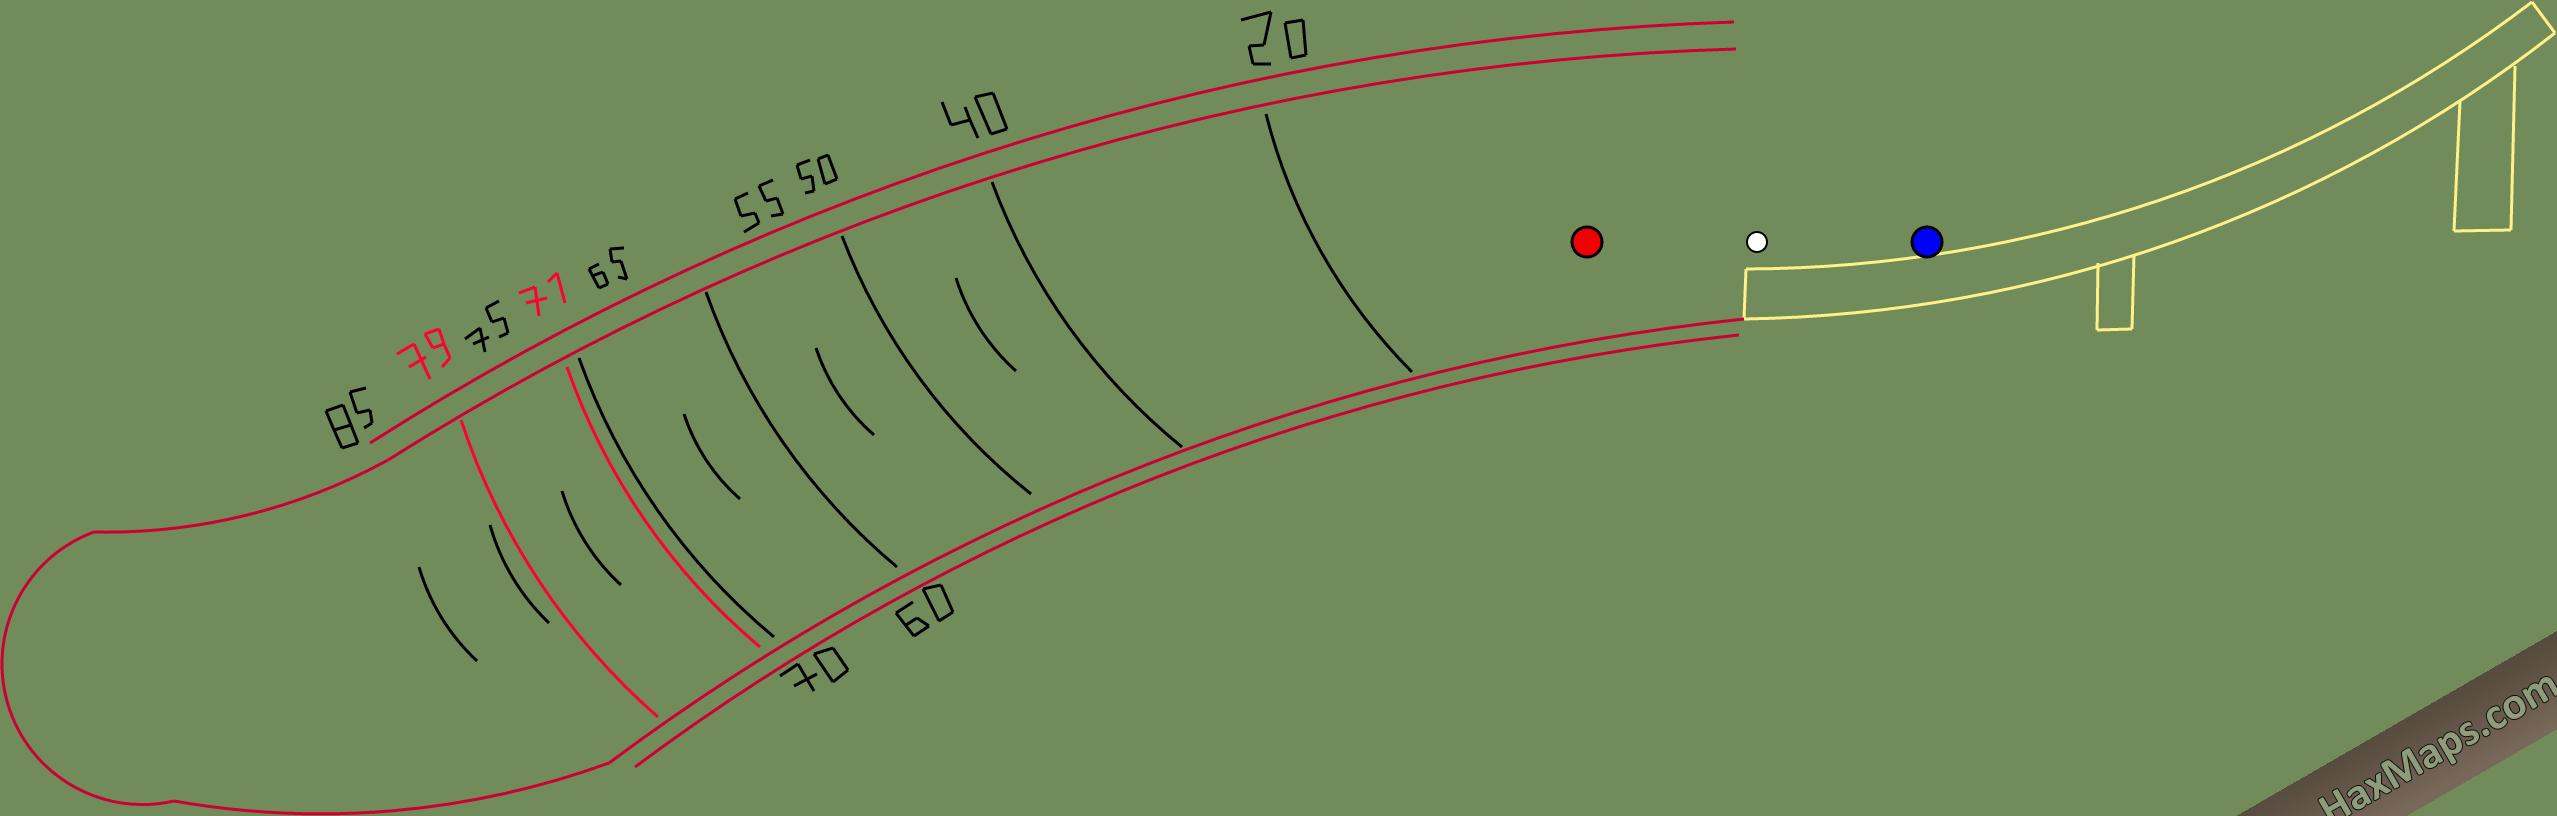 hax ball maps | Koszeg K71 HS79